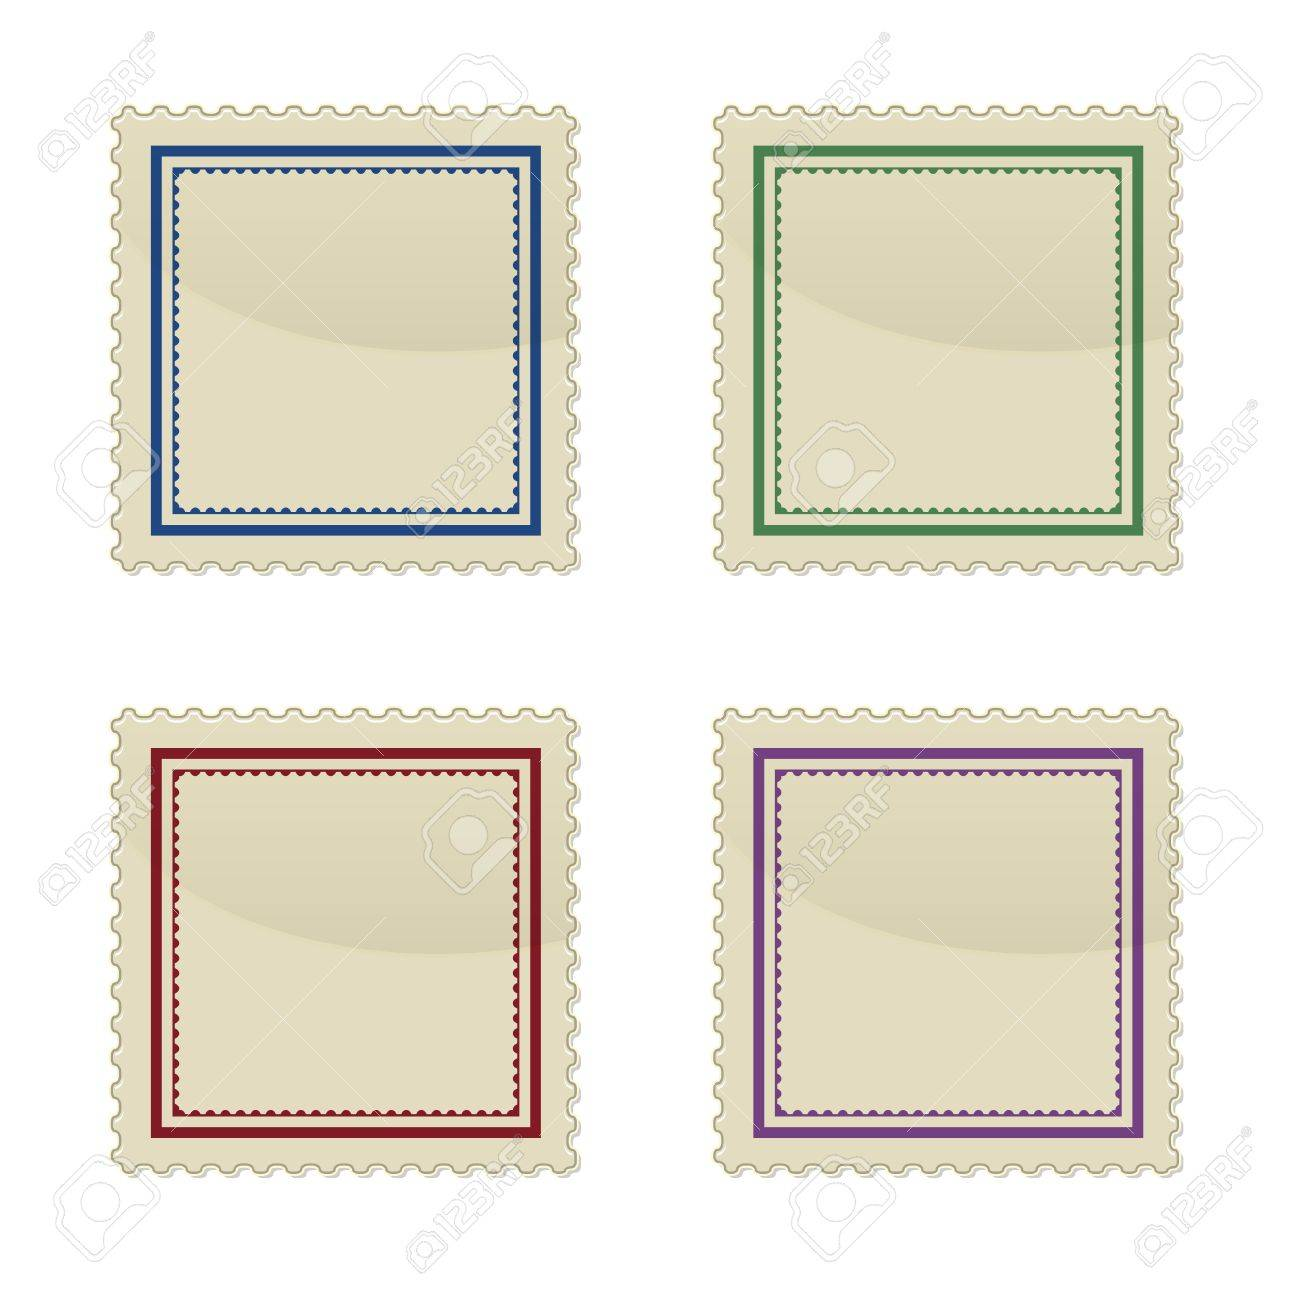 Set of stamp, square shape, vector illustration Stock Vector - 17581103